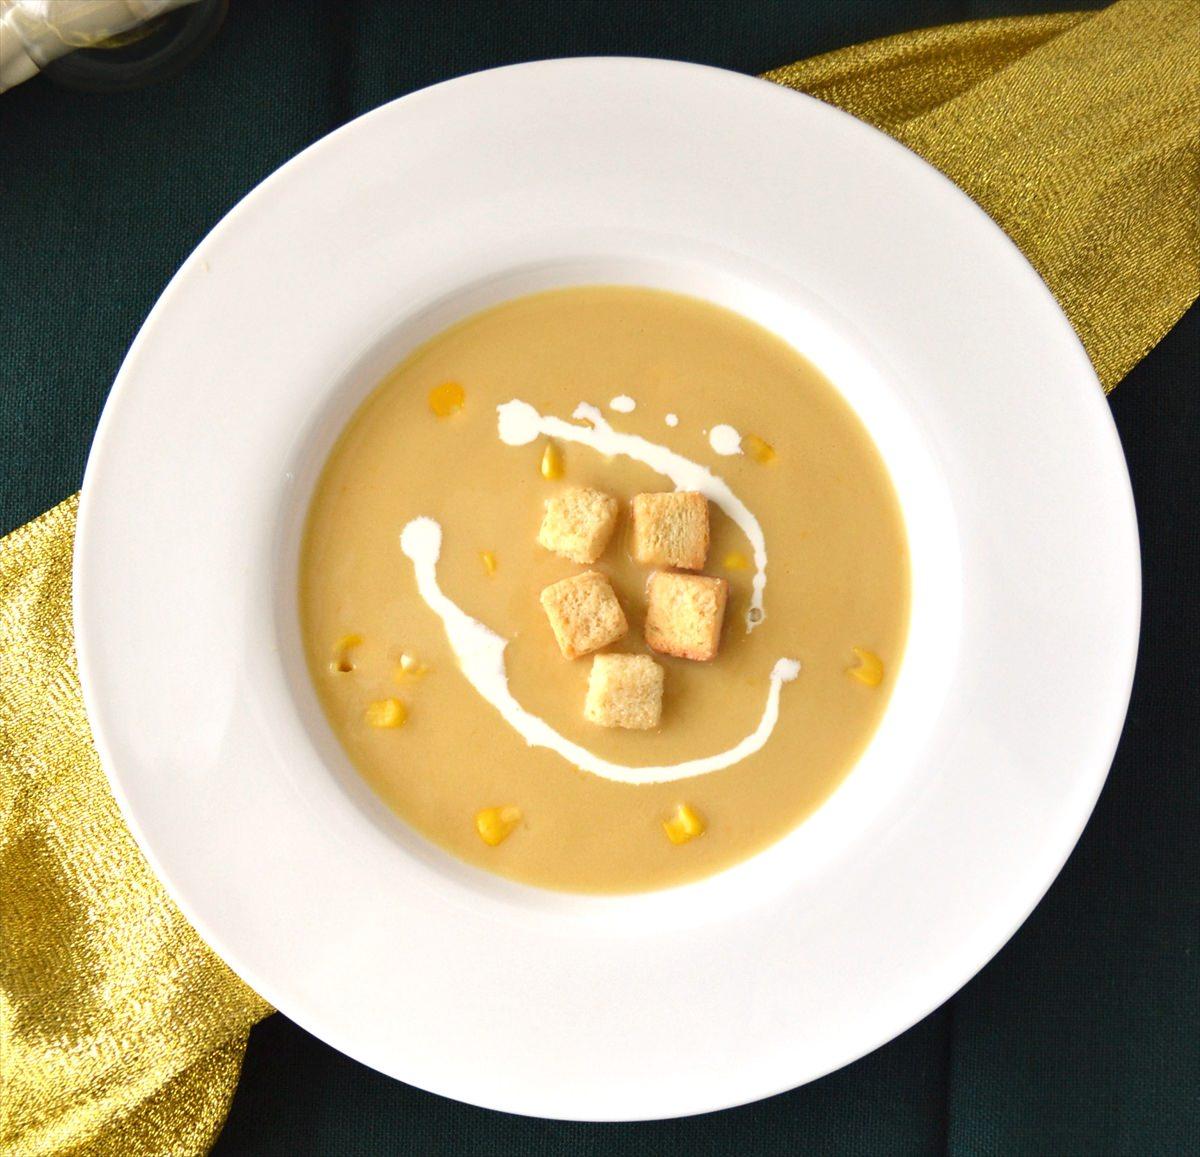 BUONO TAVOLA 美食カレー&重宝スープ詰合せ A〔カレー全2種×各1、スープ×全3種×各1〕